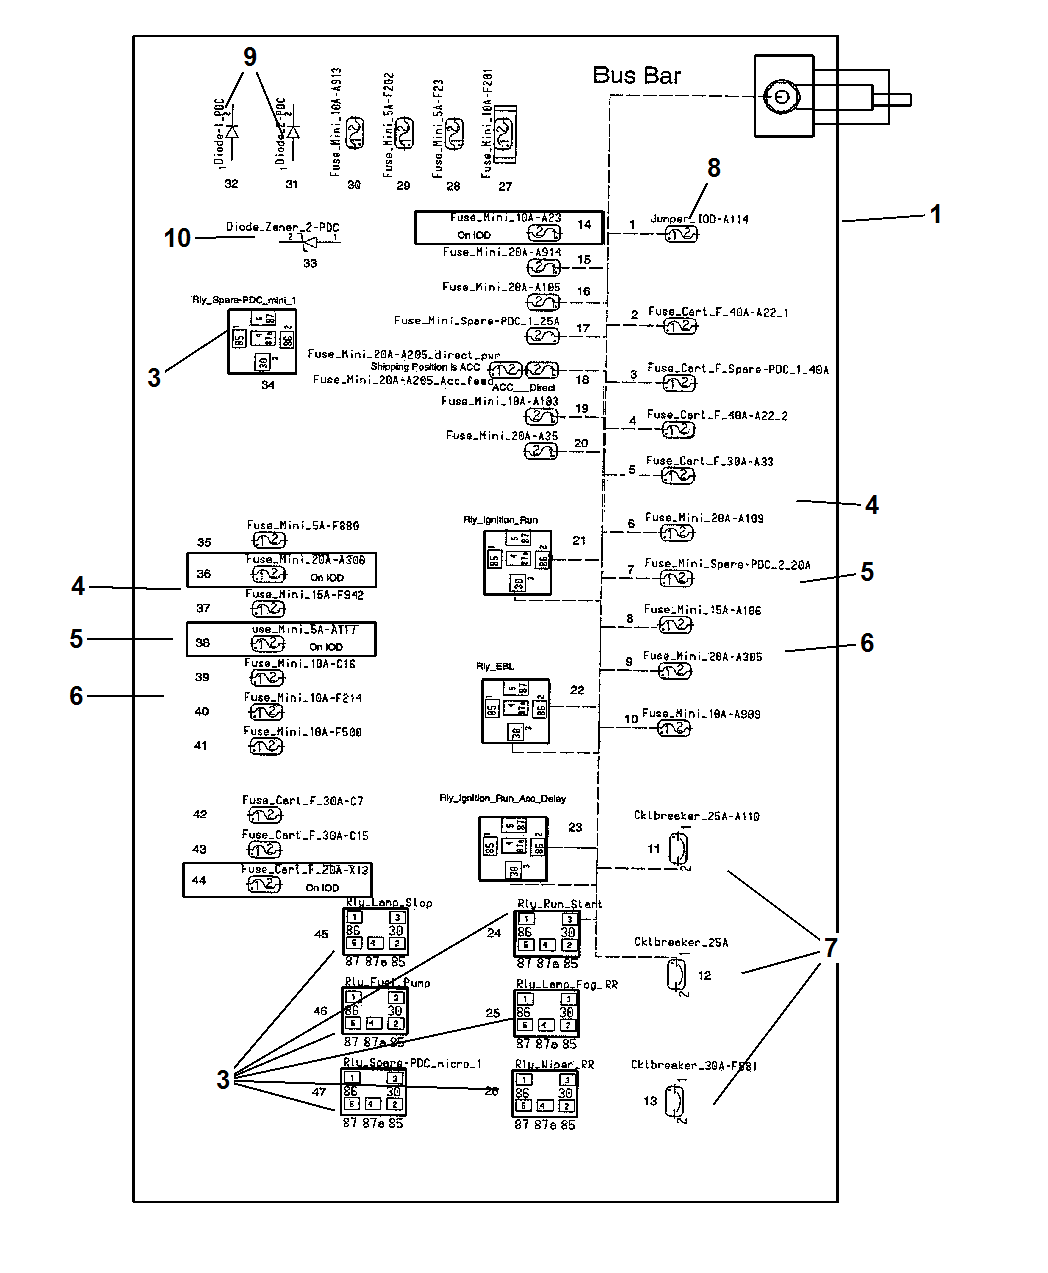 06 Dodge Charger Fuse Box Layout 2003 Vw Engine Diagram Wiring Diagram Schematics